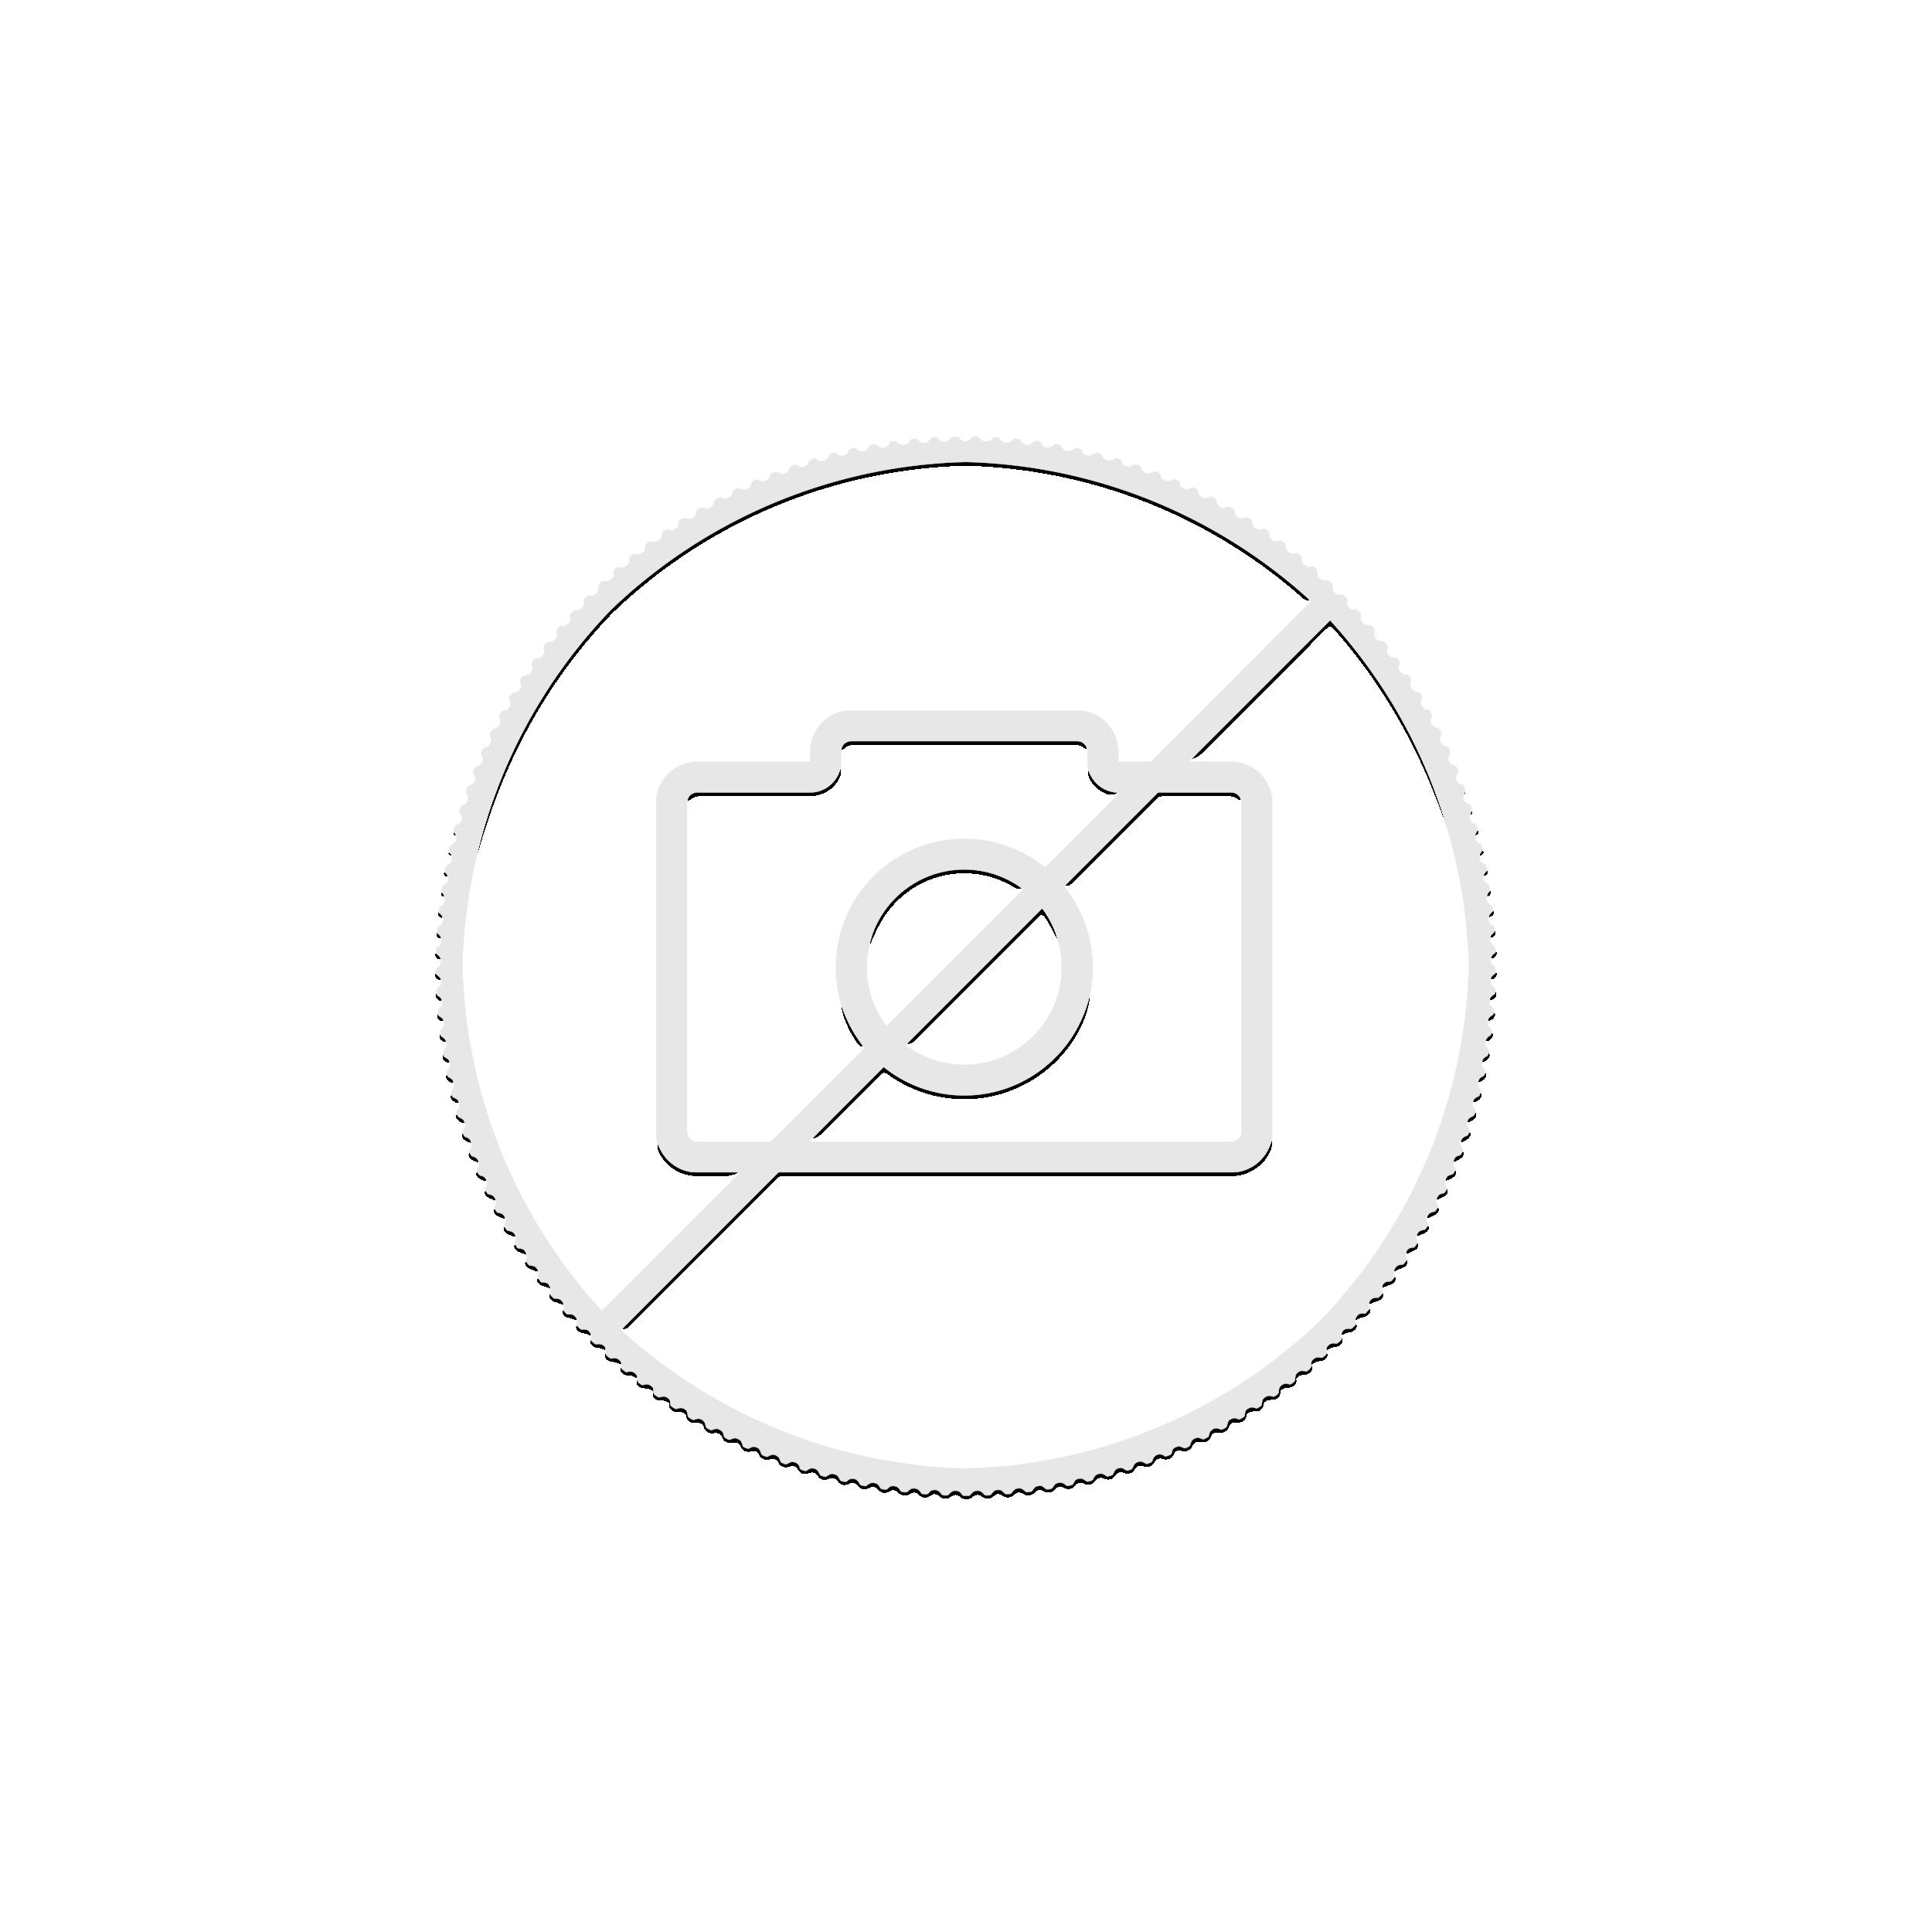 Panda 1 gram gouden munt 2022